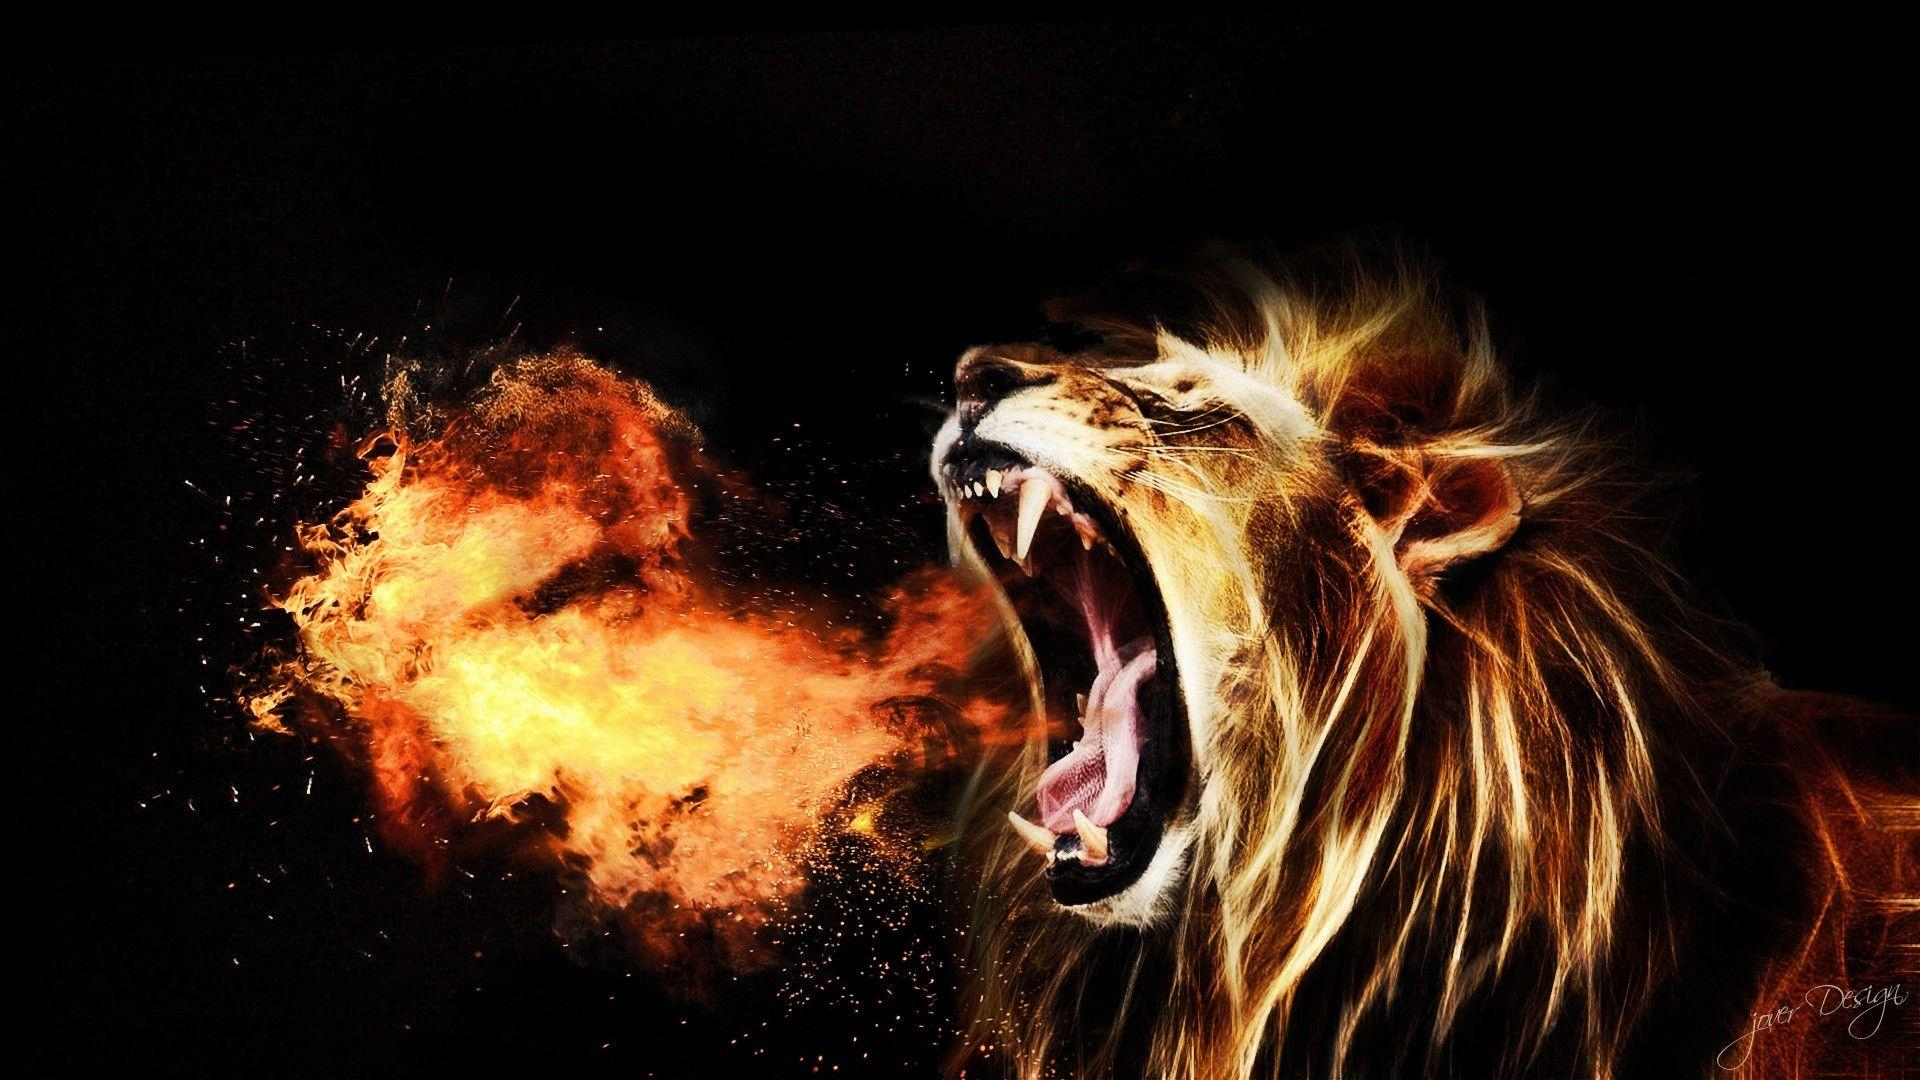 Lion Roar Wallpapers - Wallpaper Cave